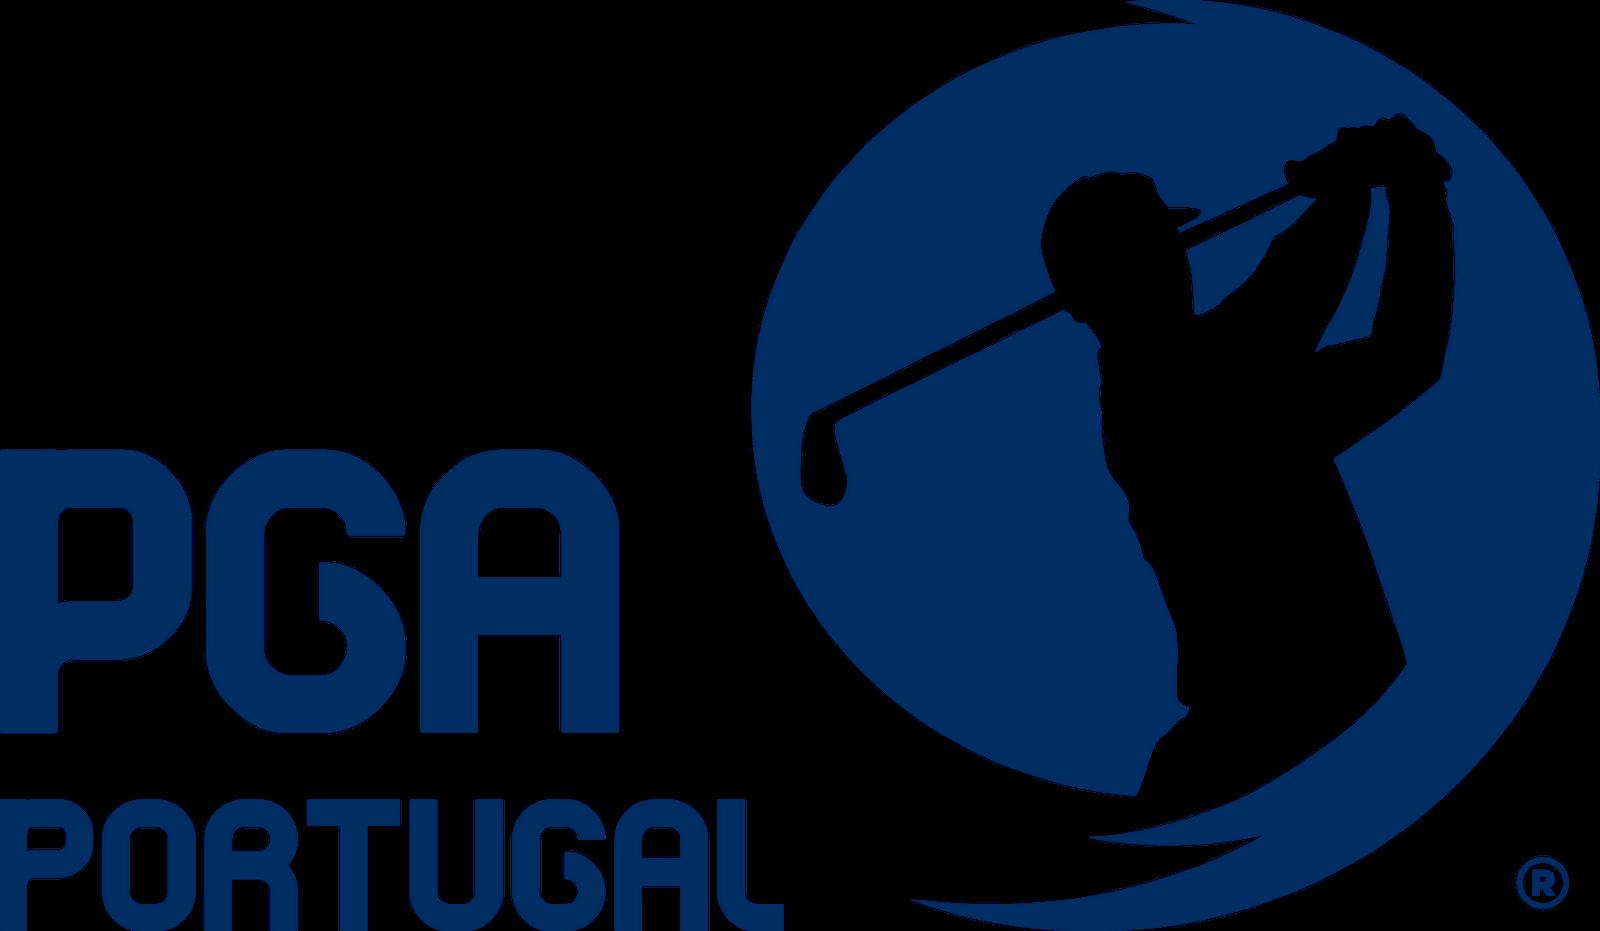 Pga portugal